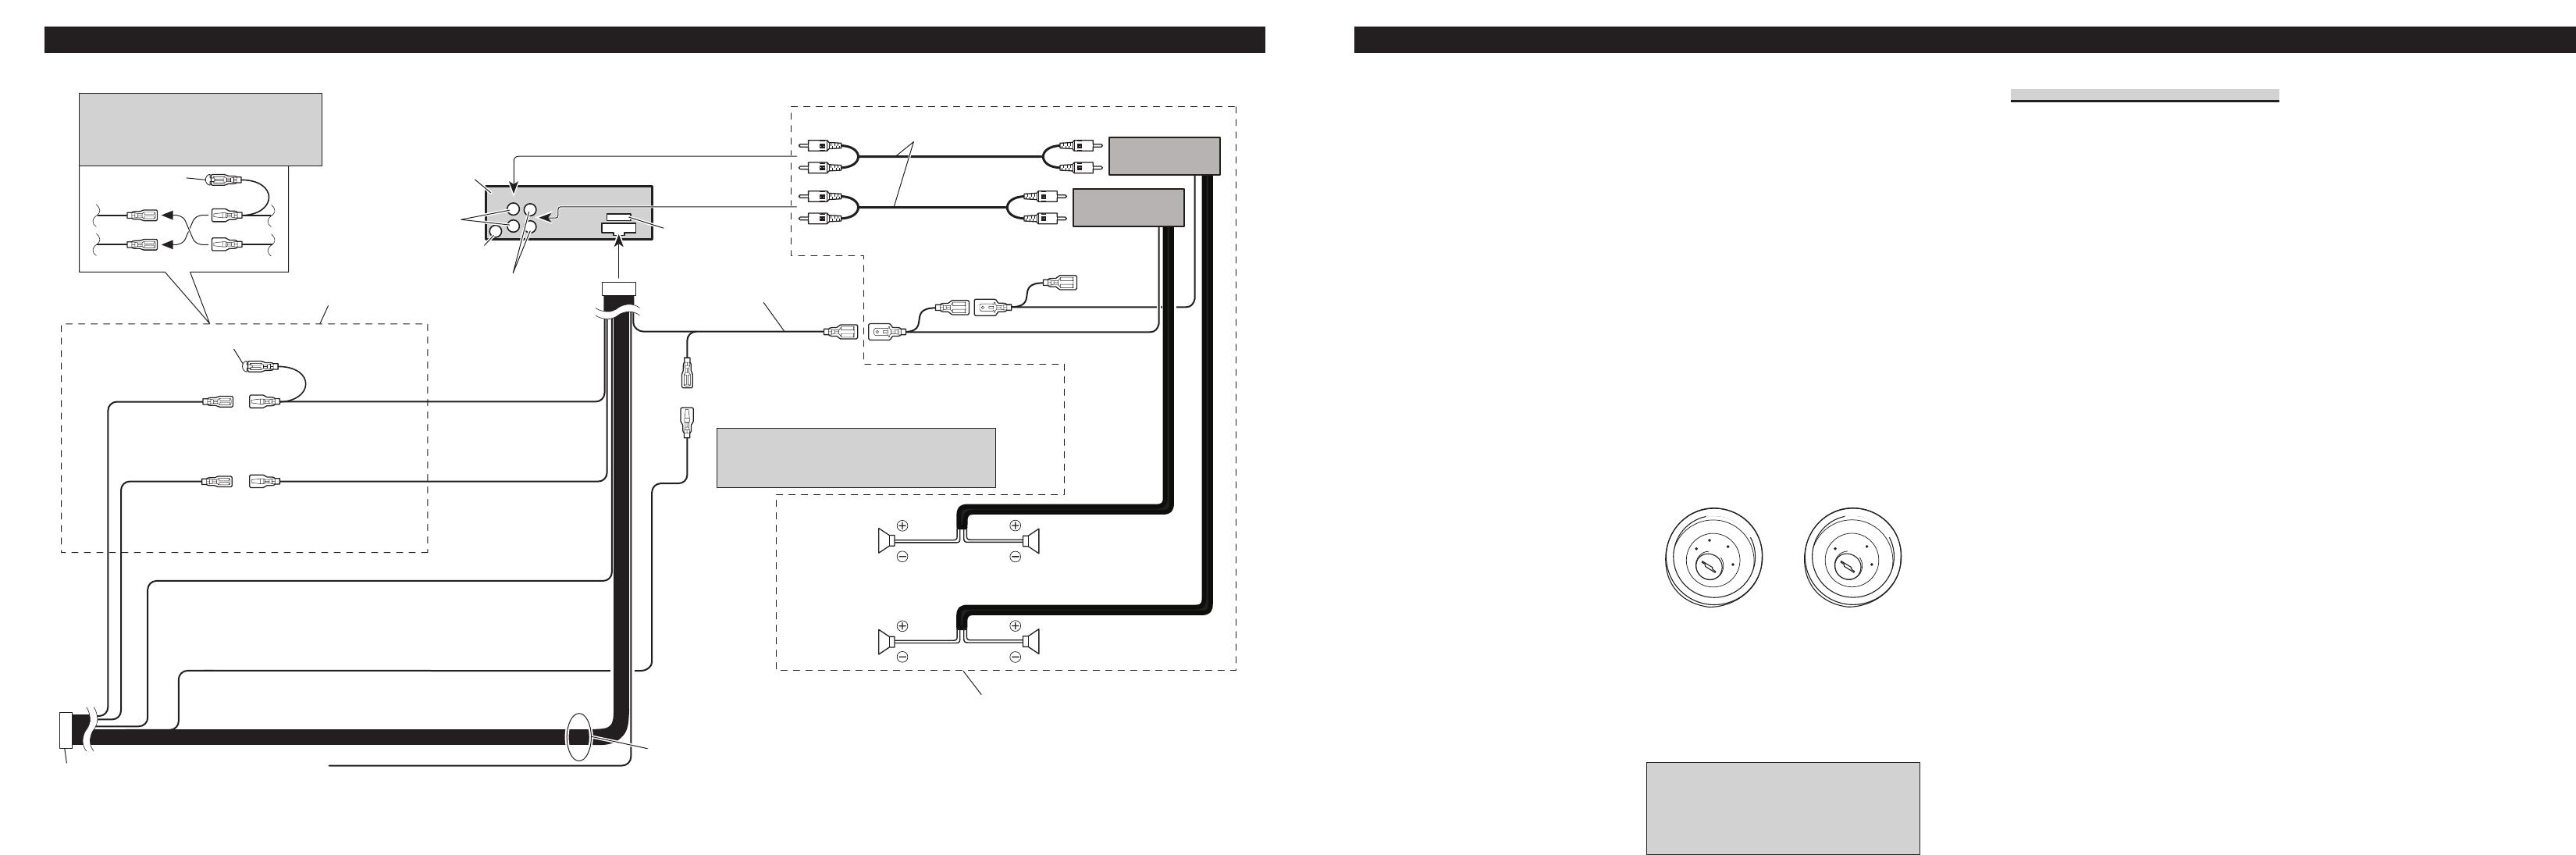 Handleiding Pioneer DEH-3400R (pagina 3 van 6) (Deutsch, English ...